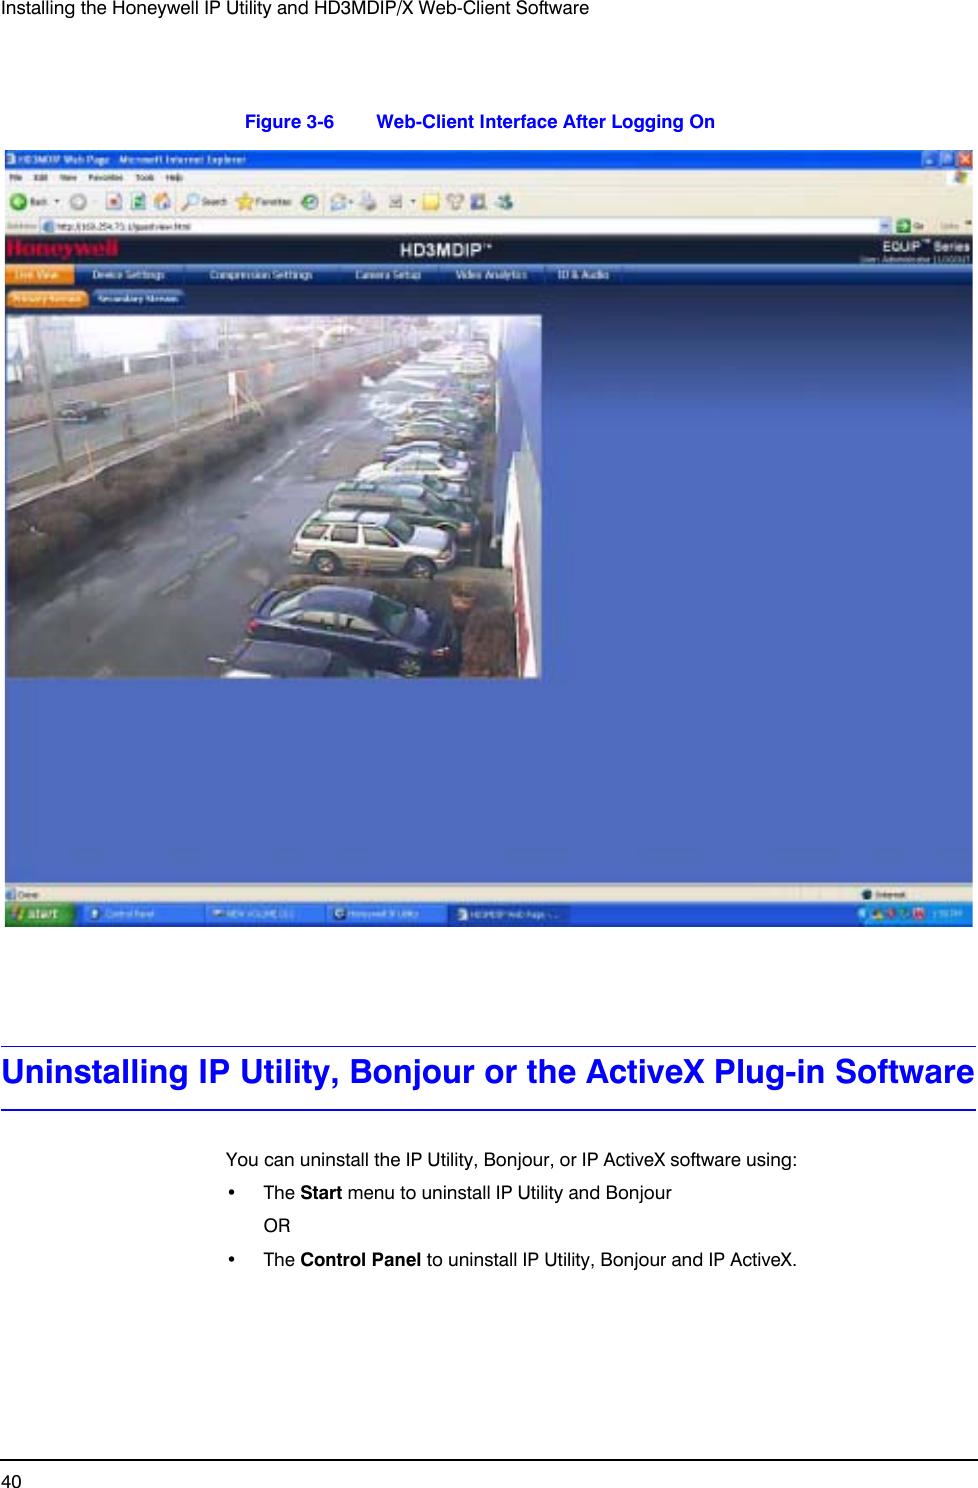 Honeywell Security Camera Hd3Mdip Users Manual EQUIP Series